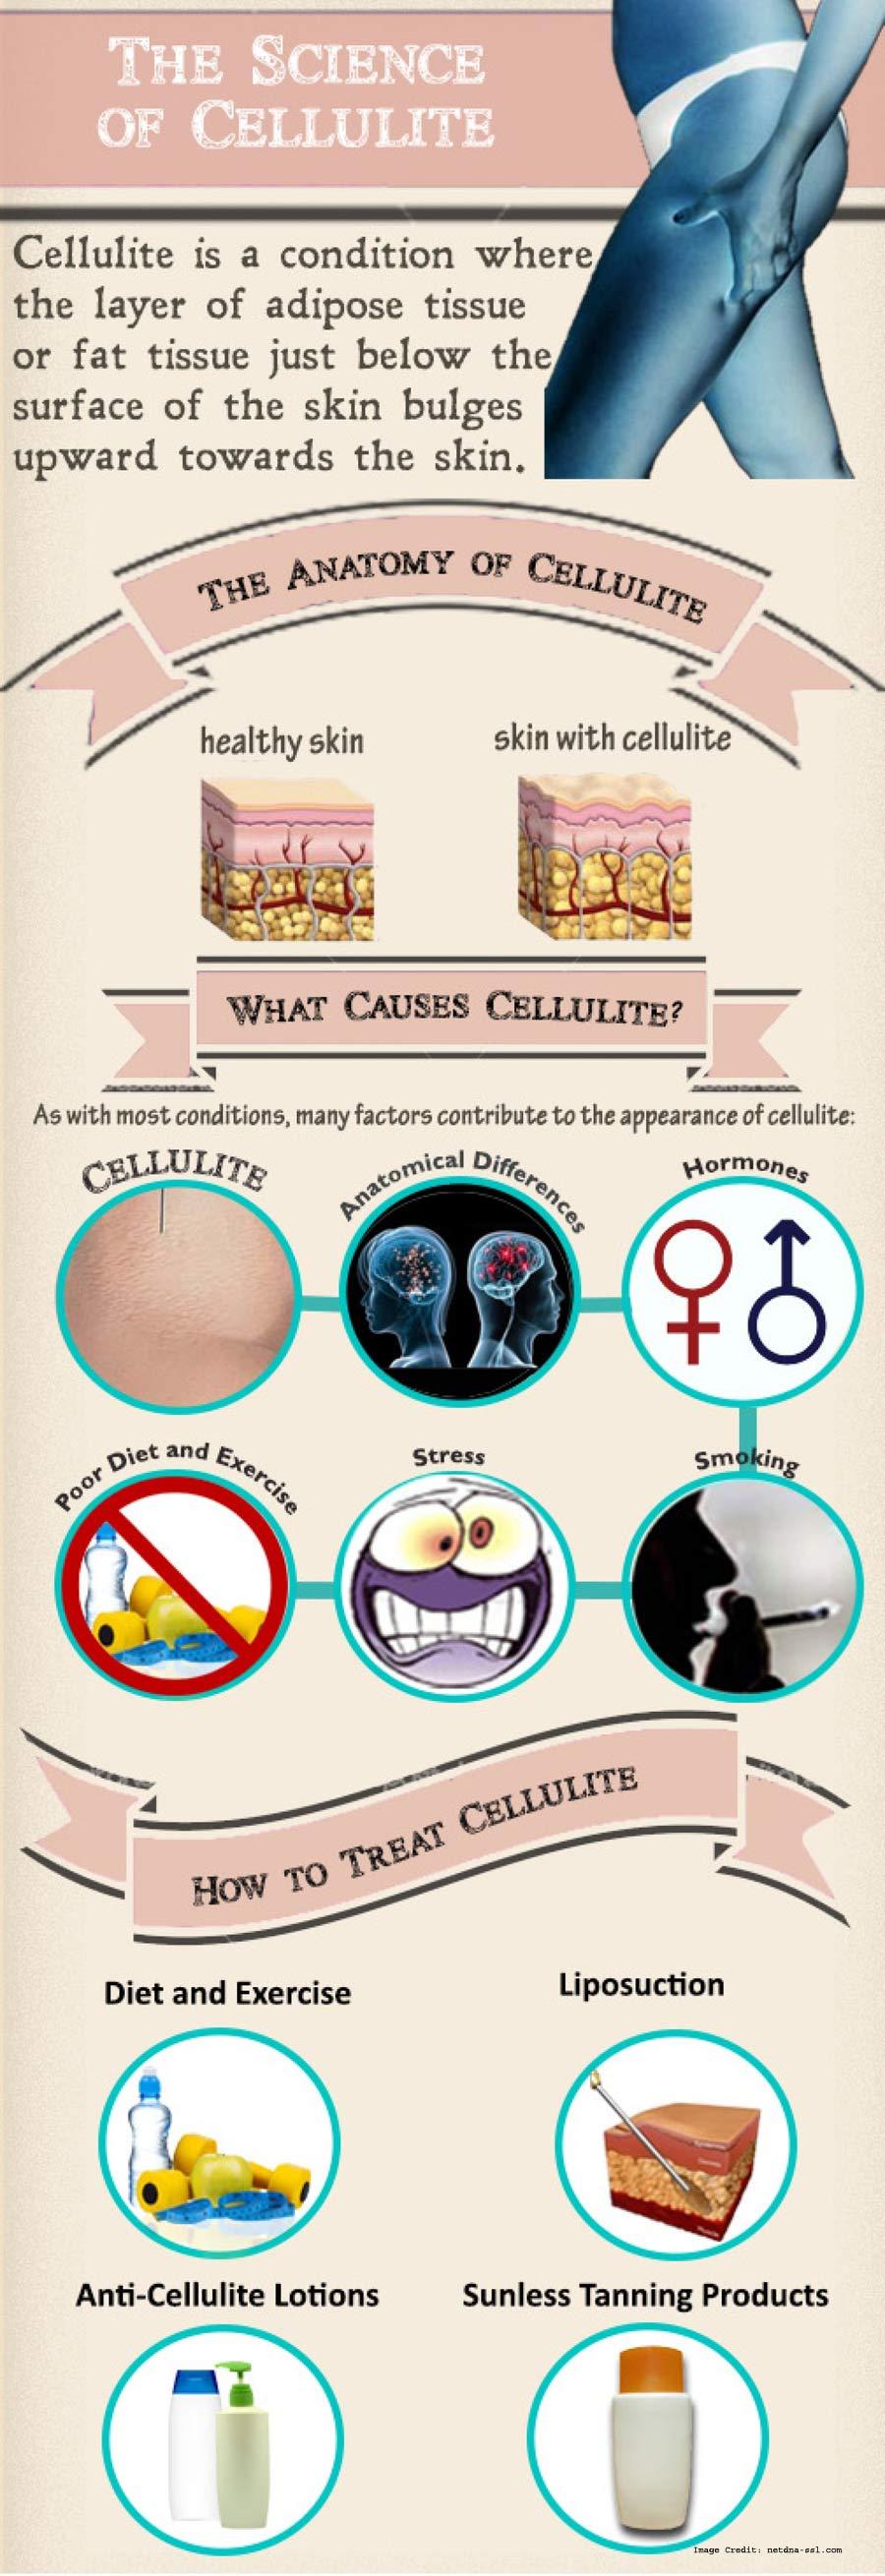 Science Cellulite